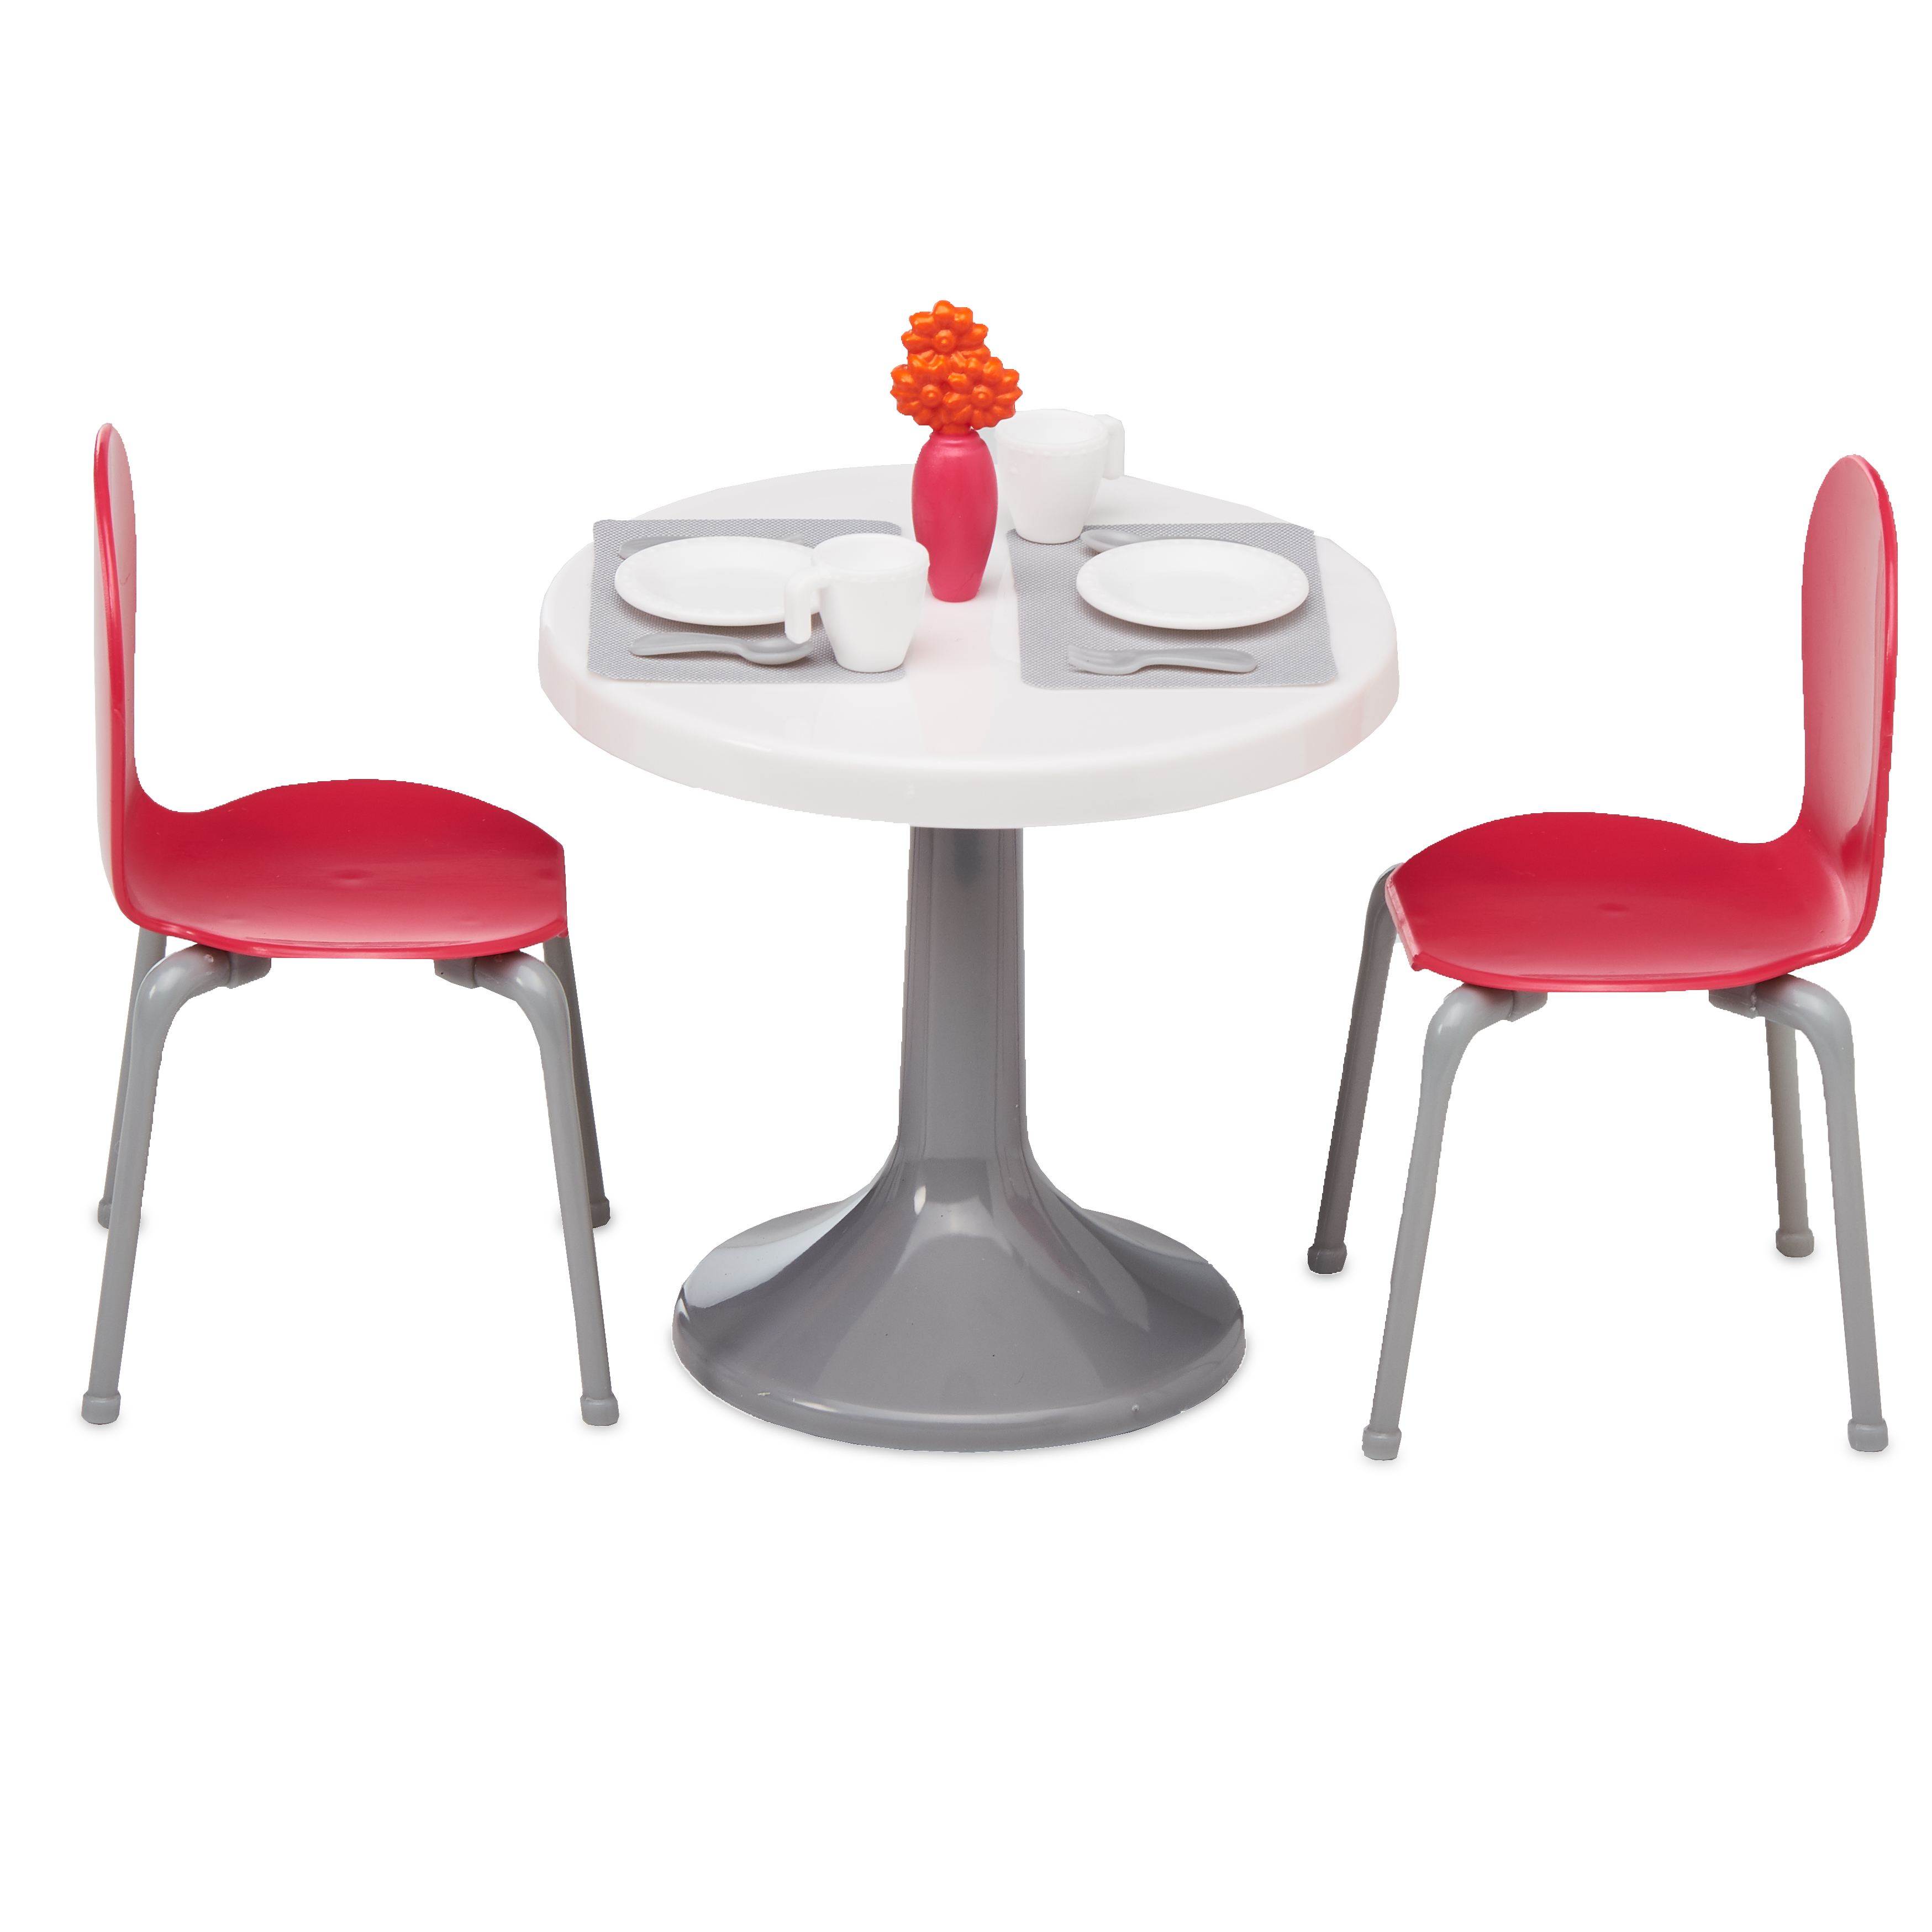 My Life As Mini Dining Room 14 Piece Play Set For 7 Mini Dolls Walmart Inventory Checker Brickseek